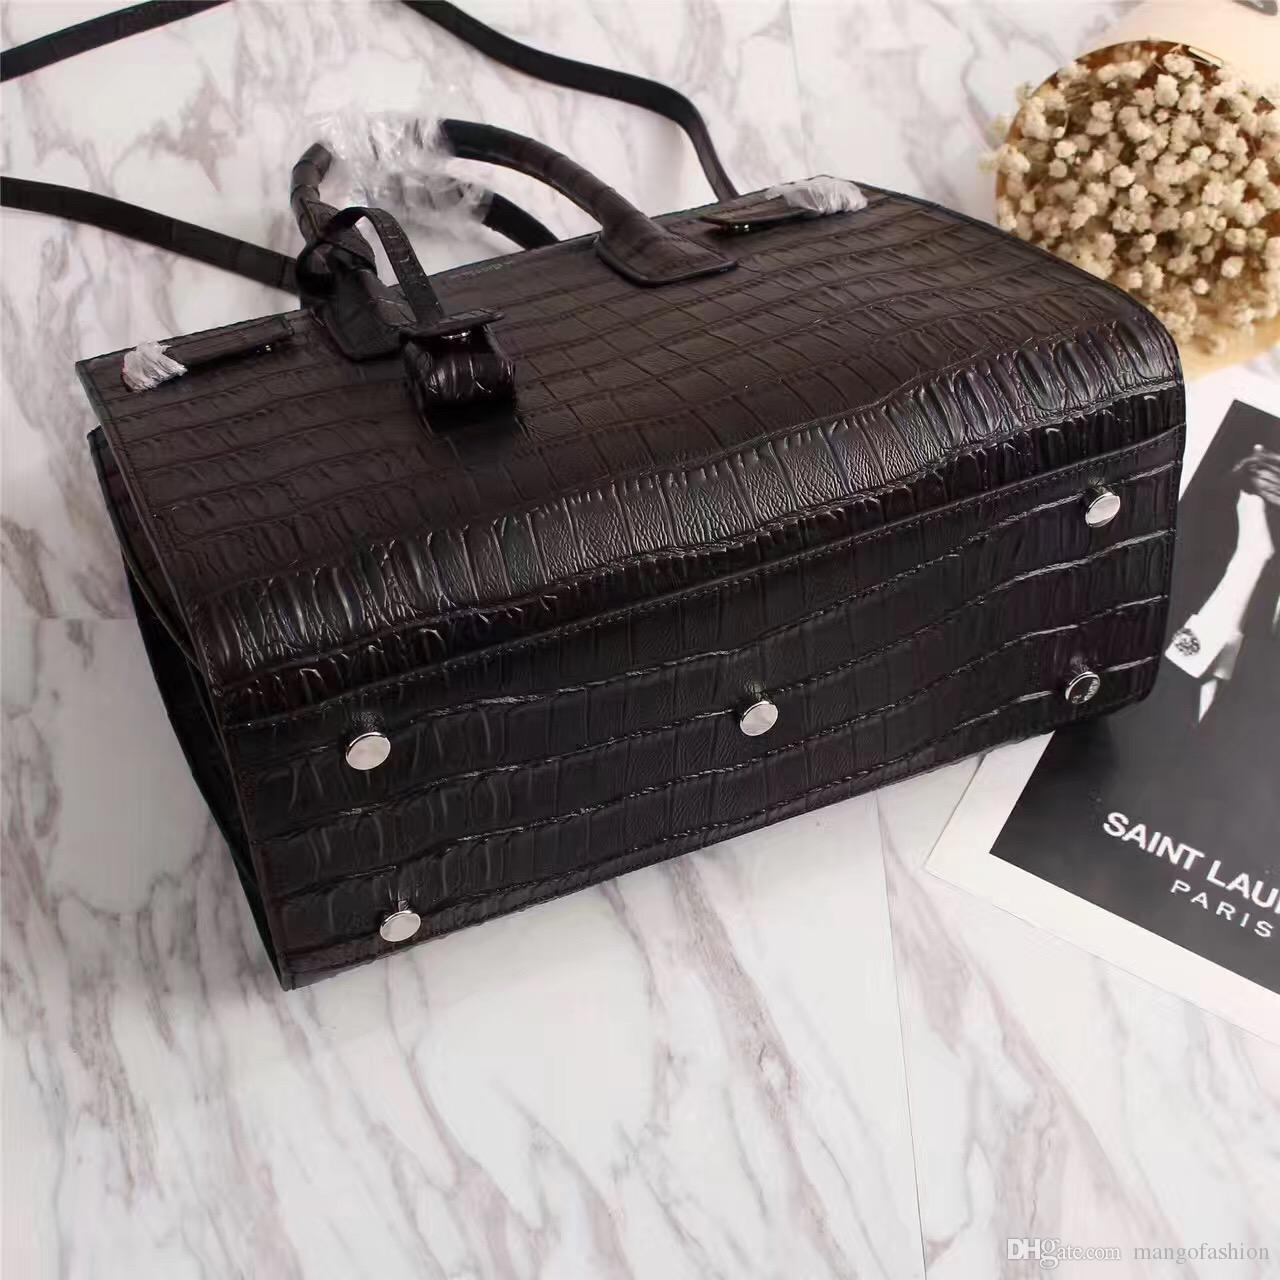 144318716 Top Quality Real Leather Fashion Women Genuine Leather Handbag Crocodile  Grain Sac De Jour Shoulder Bag Handbags Totes Bags Cute Handbags Backpacks  From ...